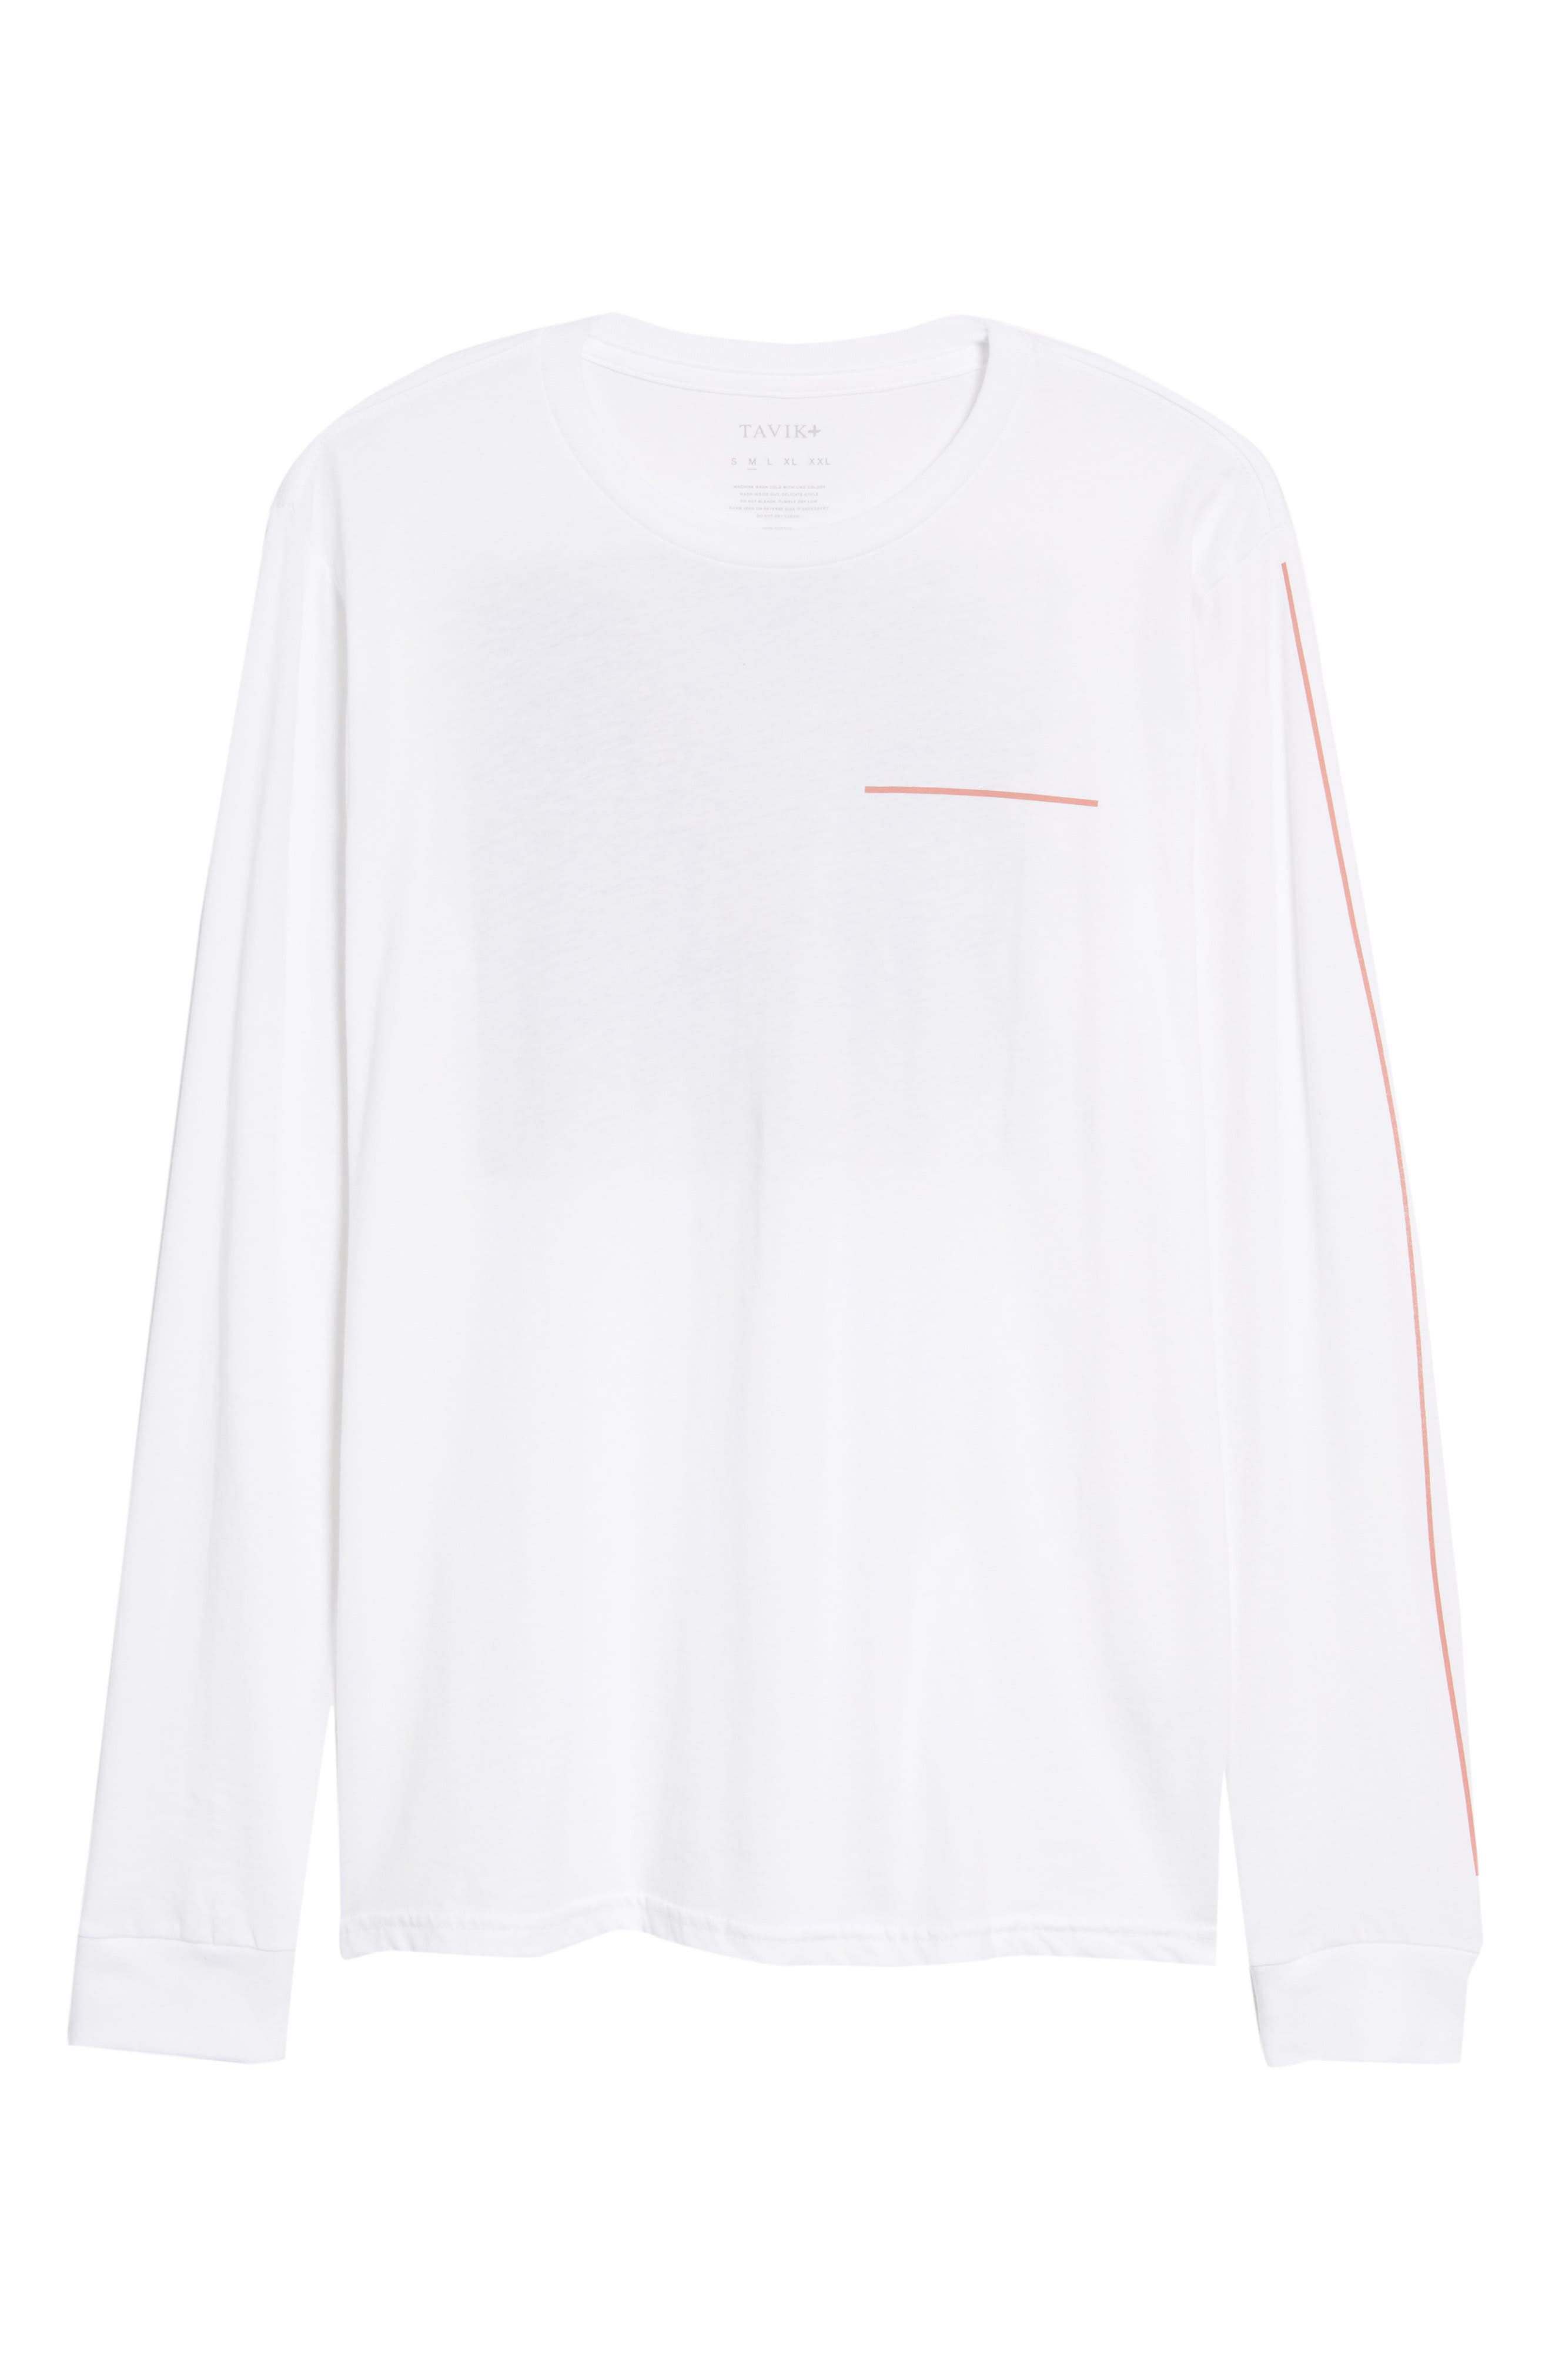 Soto Graphic T-Shirt,                             Alternate thumbnail 6, color,                             White